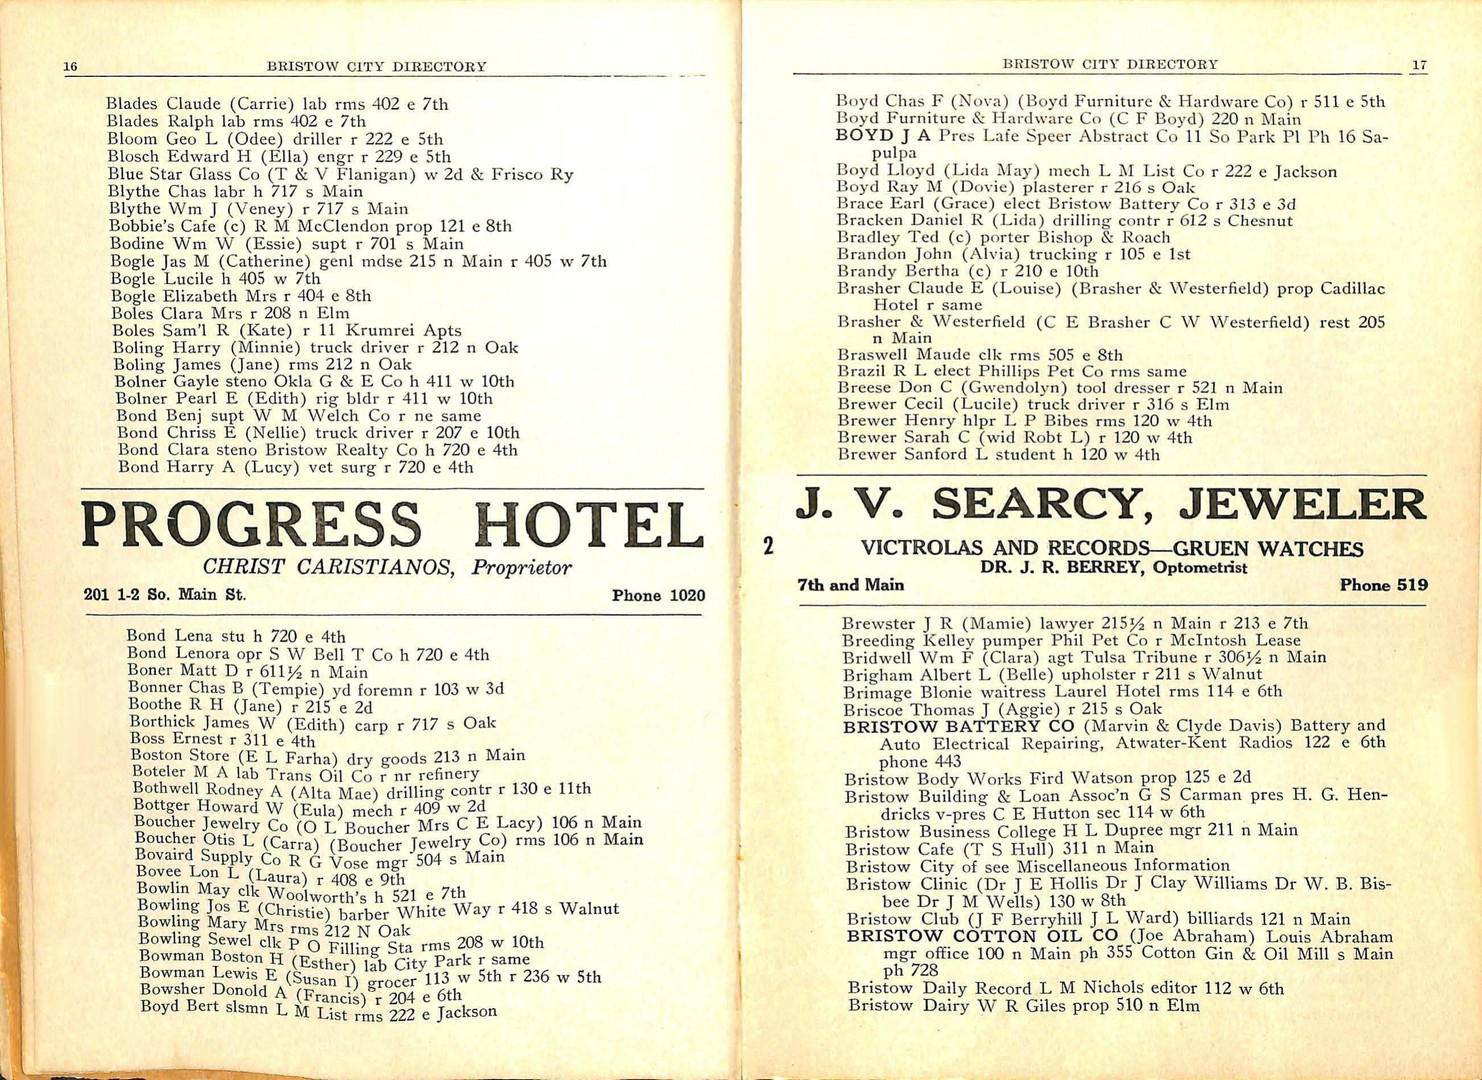 Bristow City Directory 1926_010.jpg